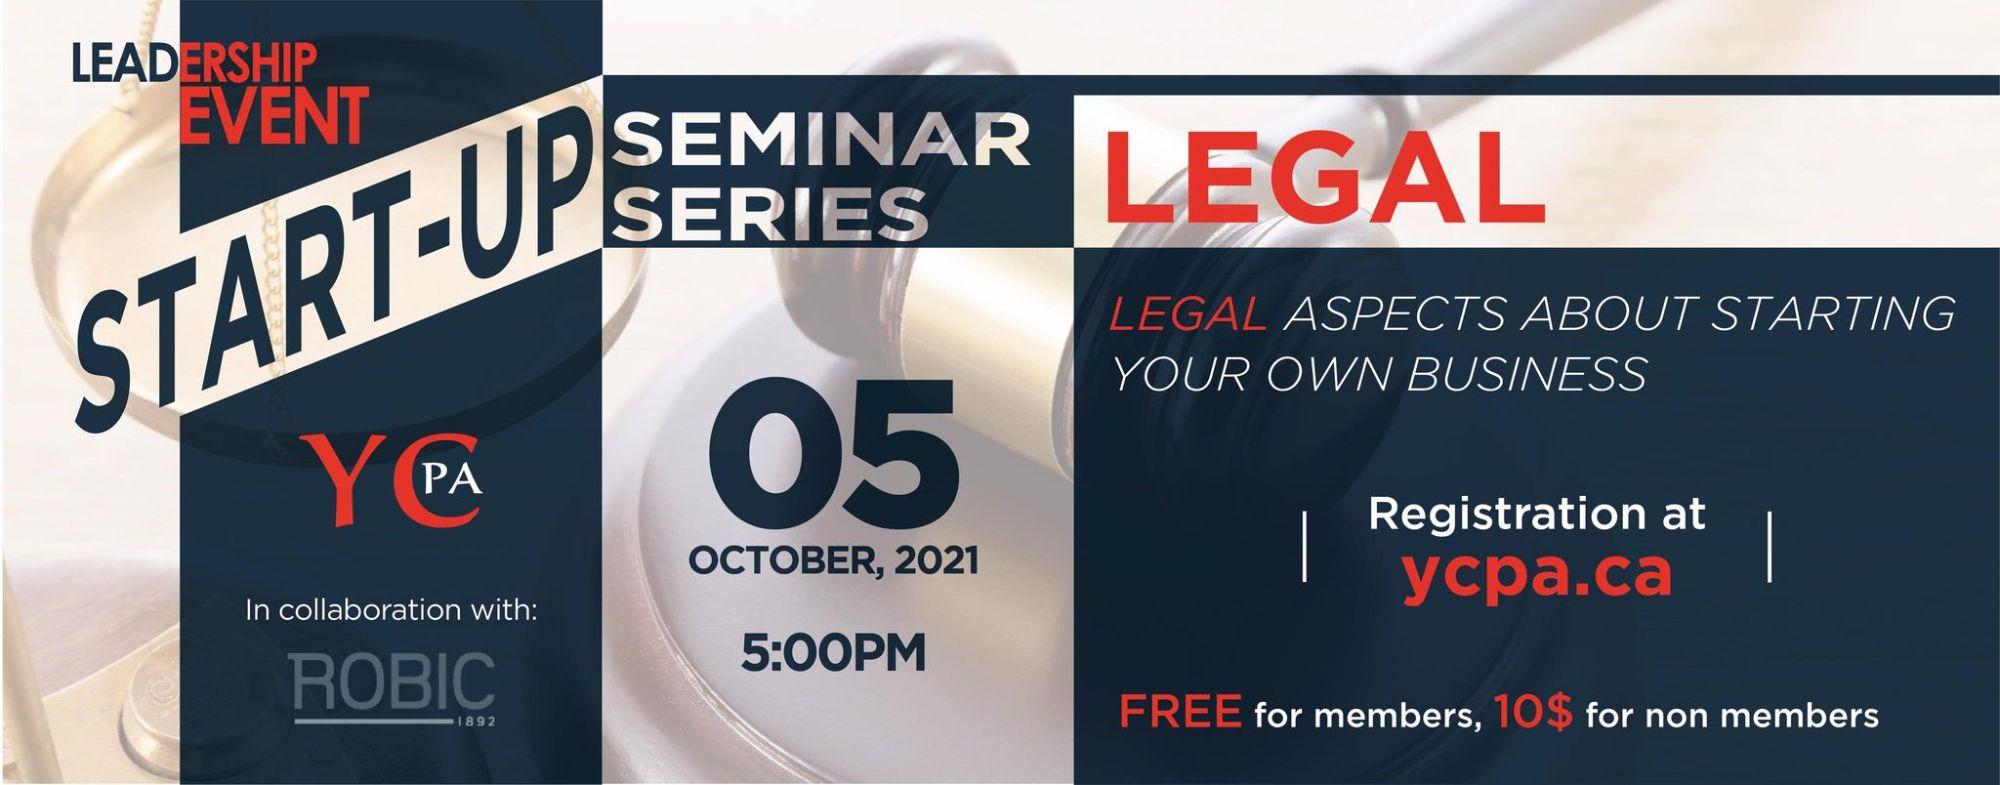 Leadership Event - Startup Seminar Series - Legal